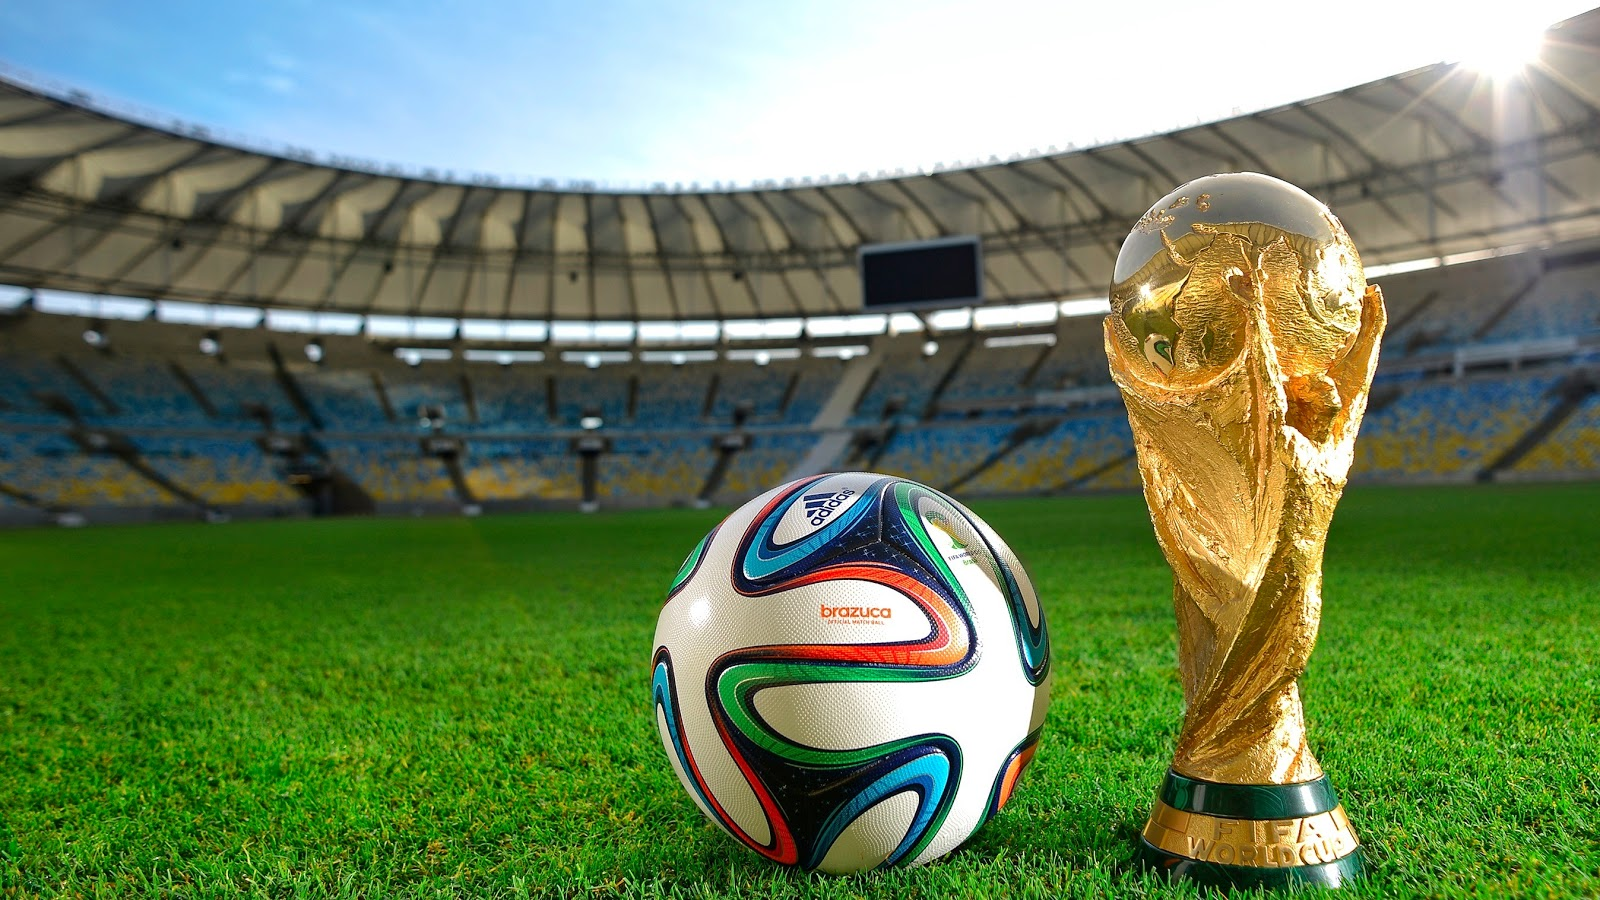 https://2.bp.blogspot.com/-xeierqN7lB0/U6bvVZsbOsI/AAAAAAAAZ3M/w6UYDa_xcBk/s1600/Fifa-World-Cup-2014-Trophy-and-Ball-HD-Wallpapers.jpg